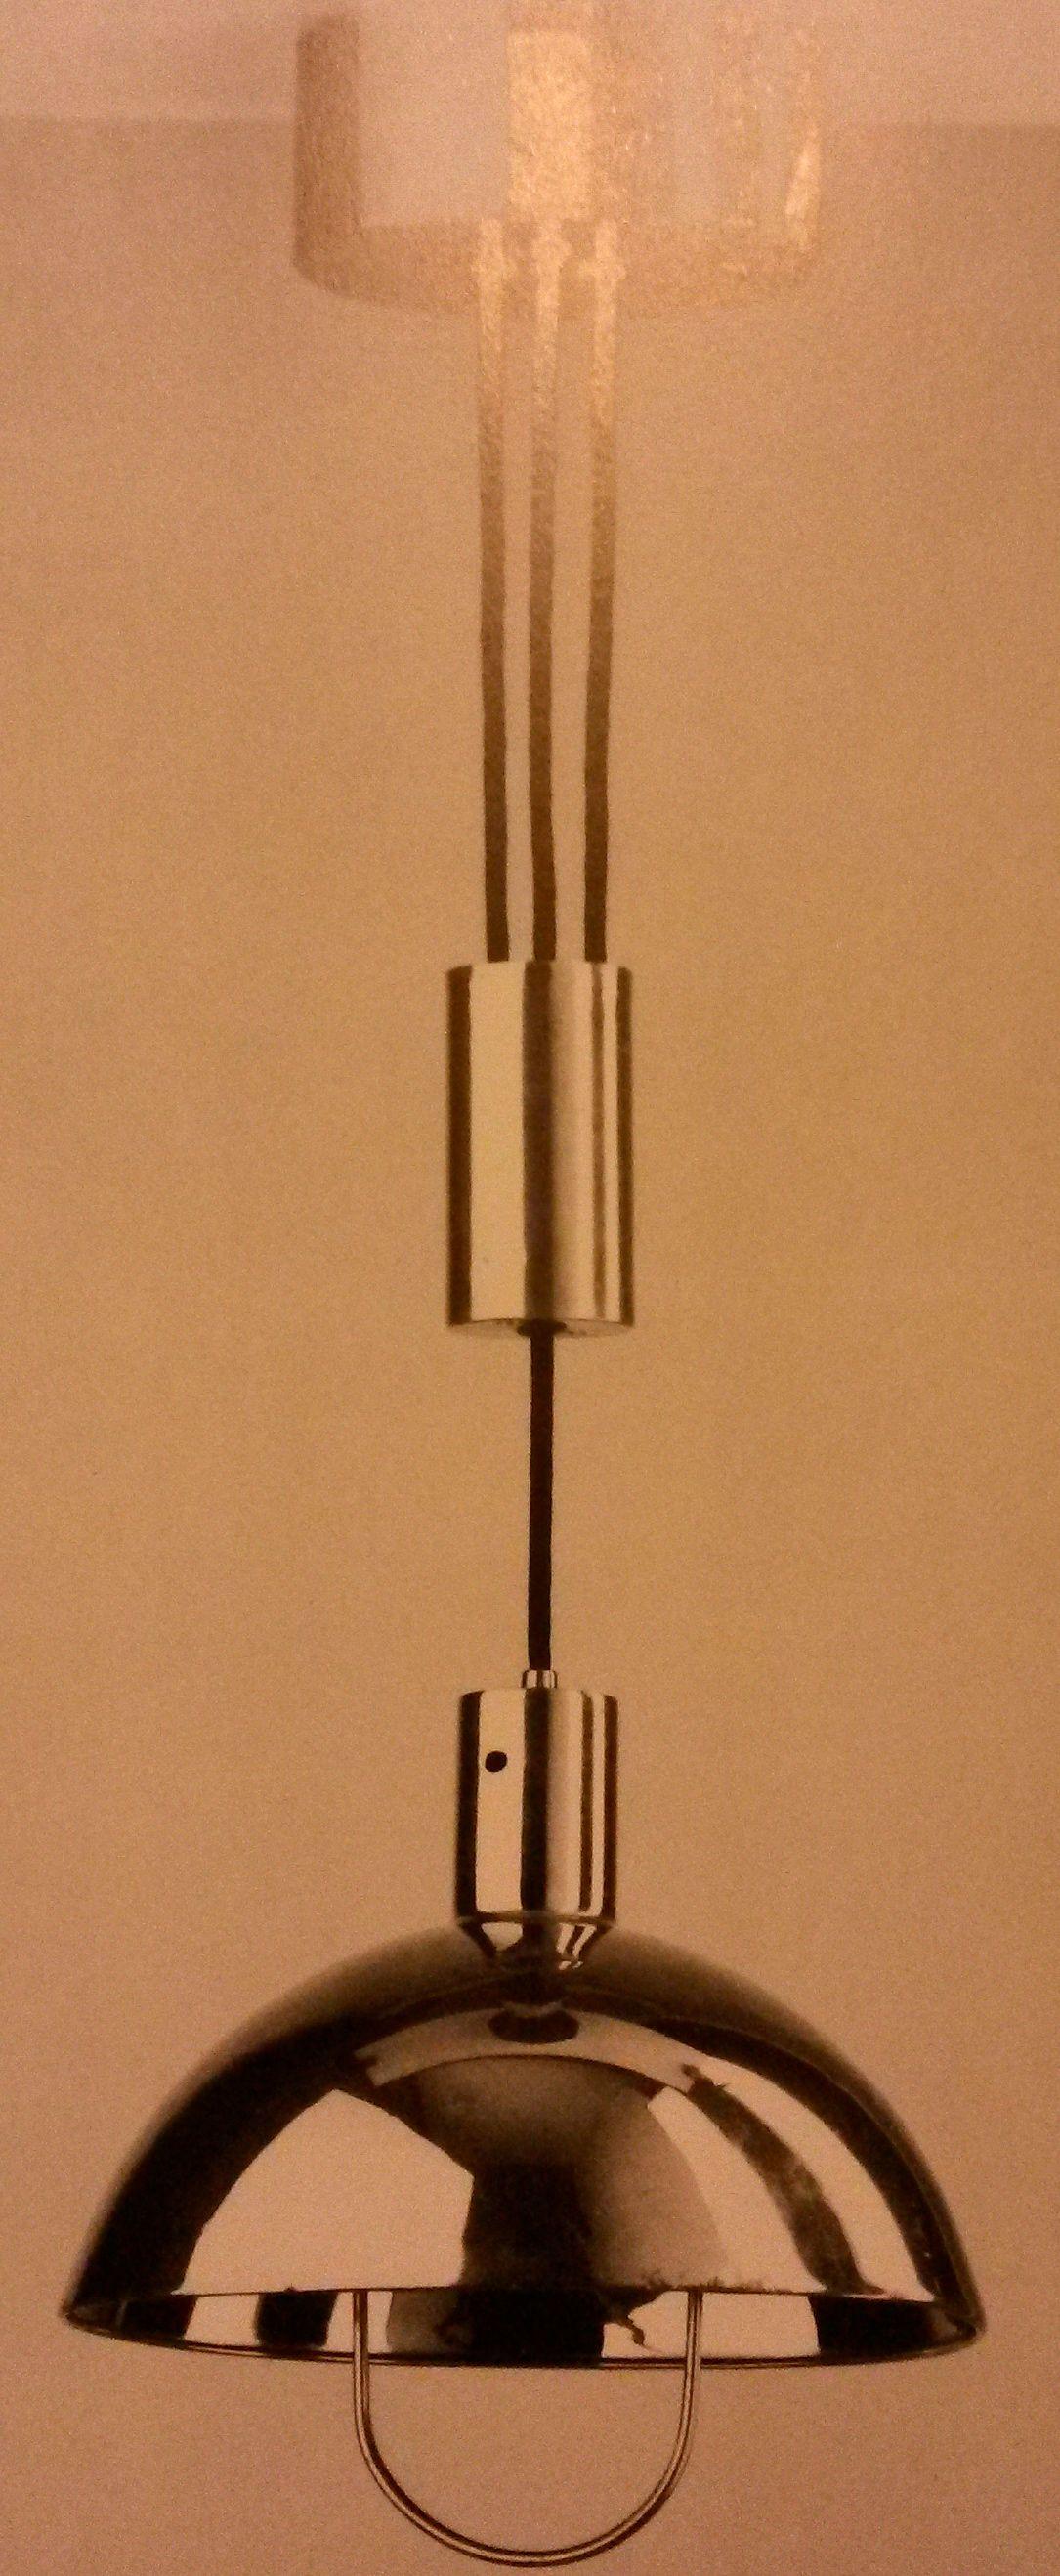 Bauhaus pendant lamp marianne brandt and hans przyrembel 1925 - Marianne Brandt And Hans Przyrembel Hanging Lamp 1926